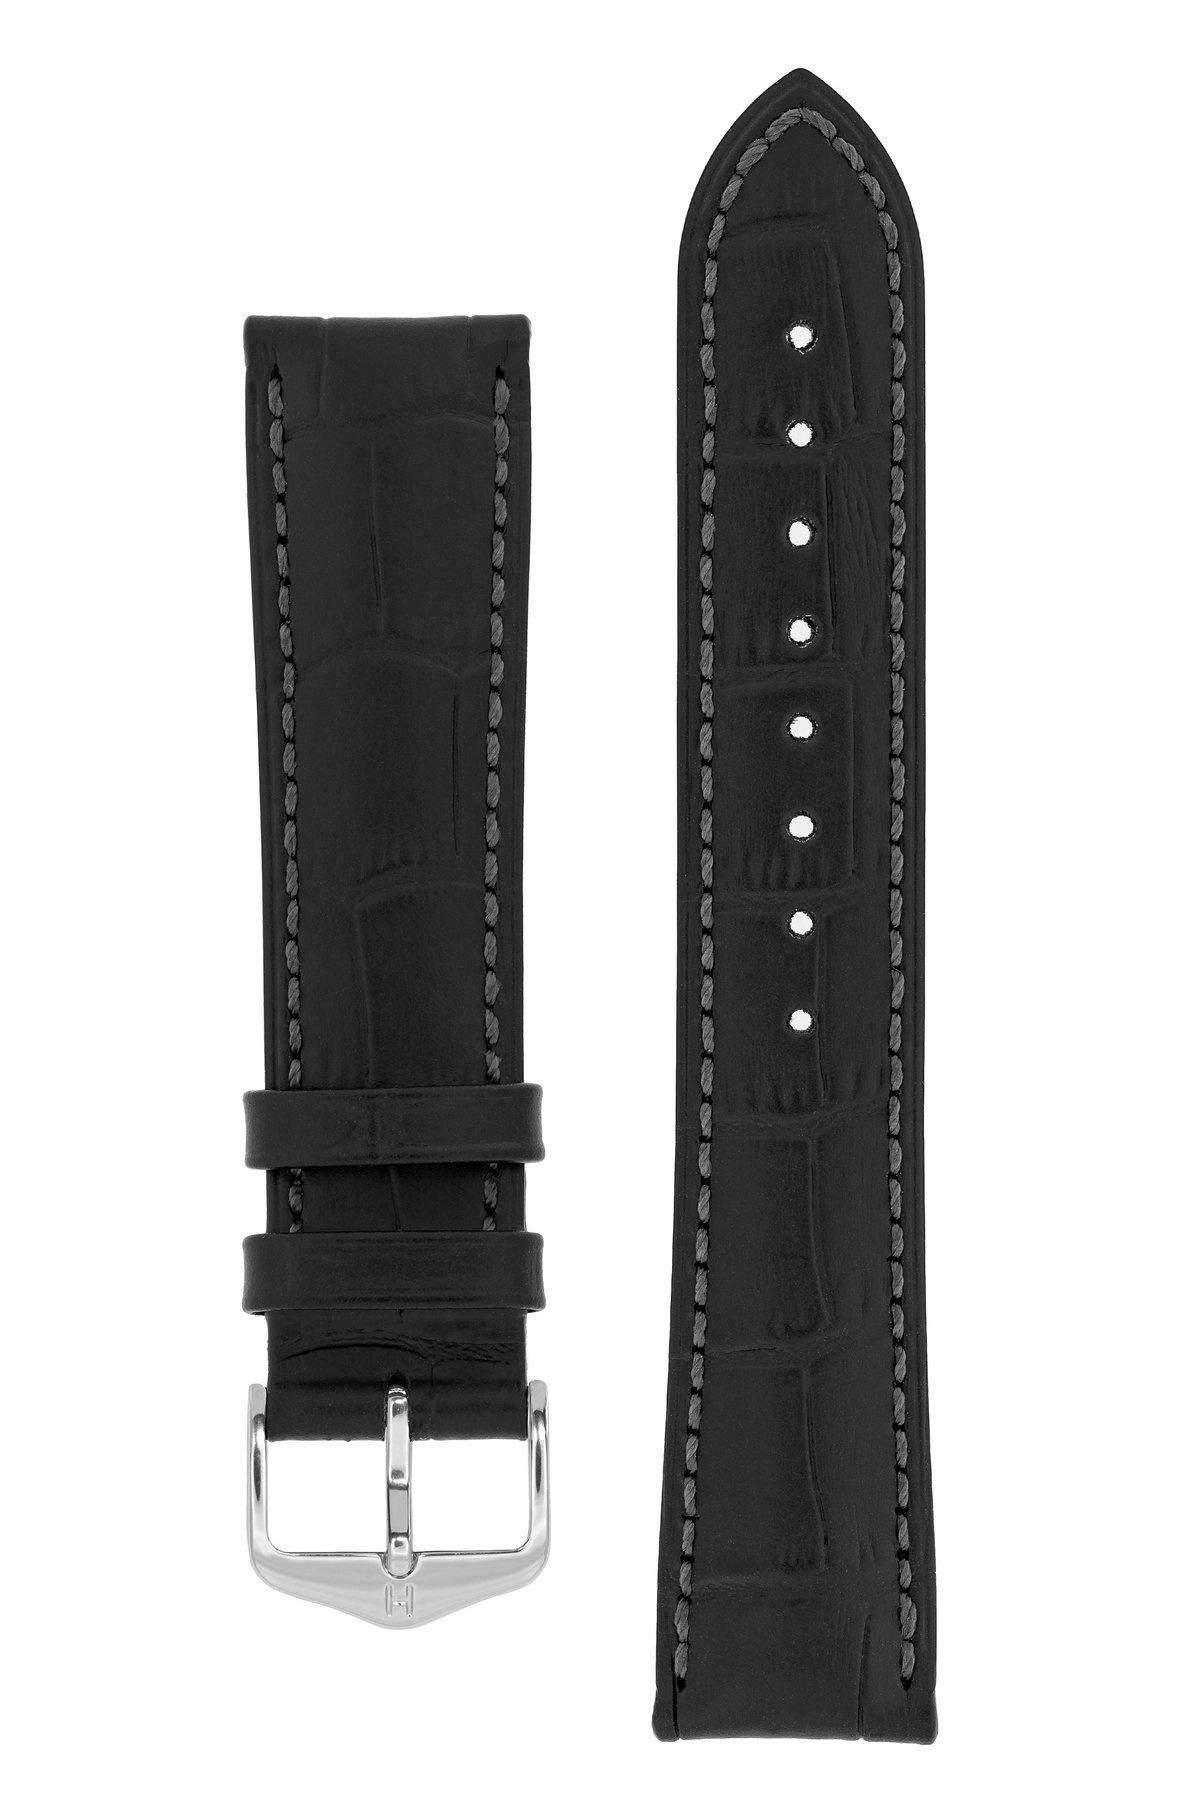 Horlogebandje Duke Alligator embossed Kalfsleer 16 mm-10